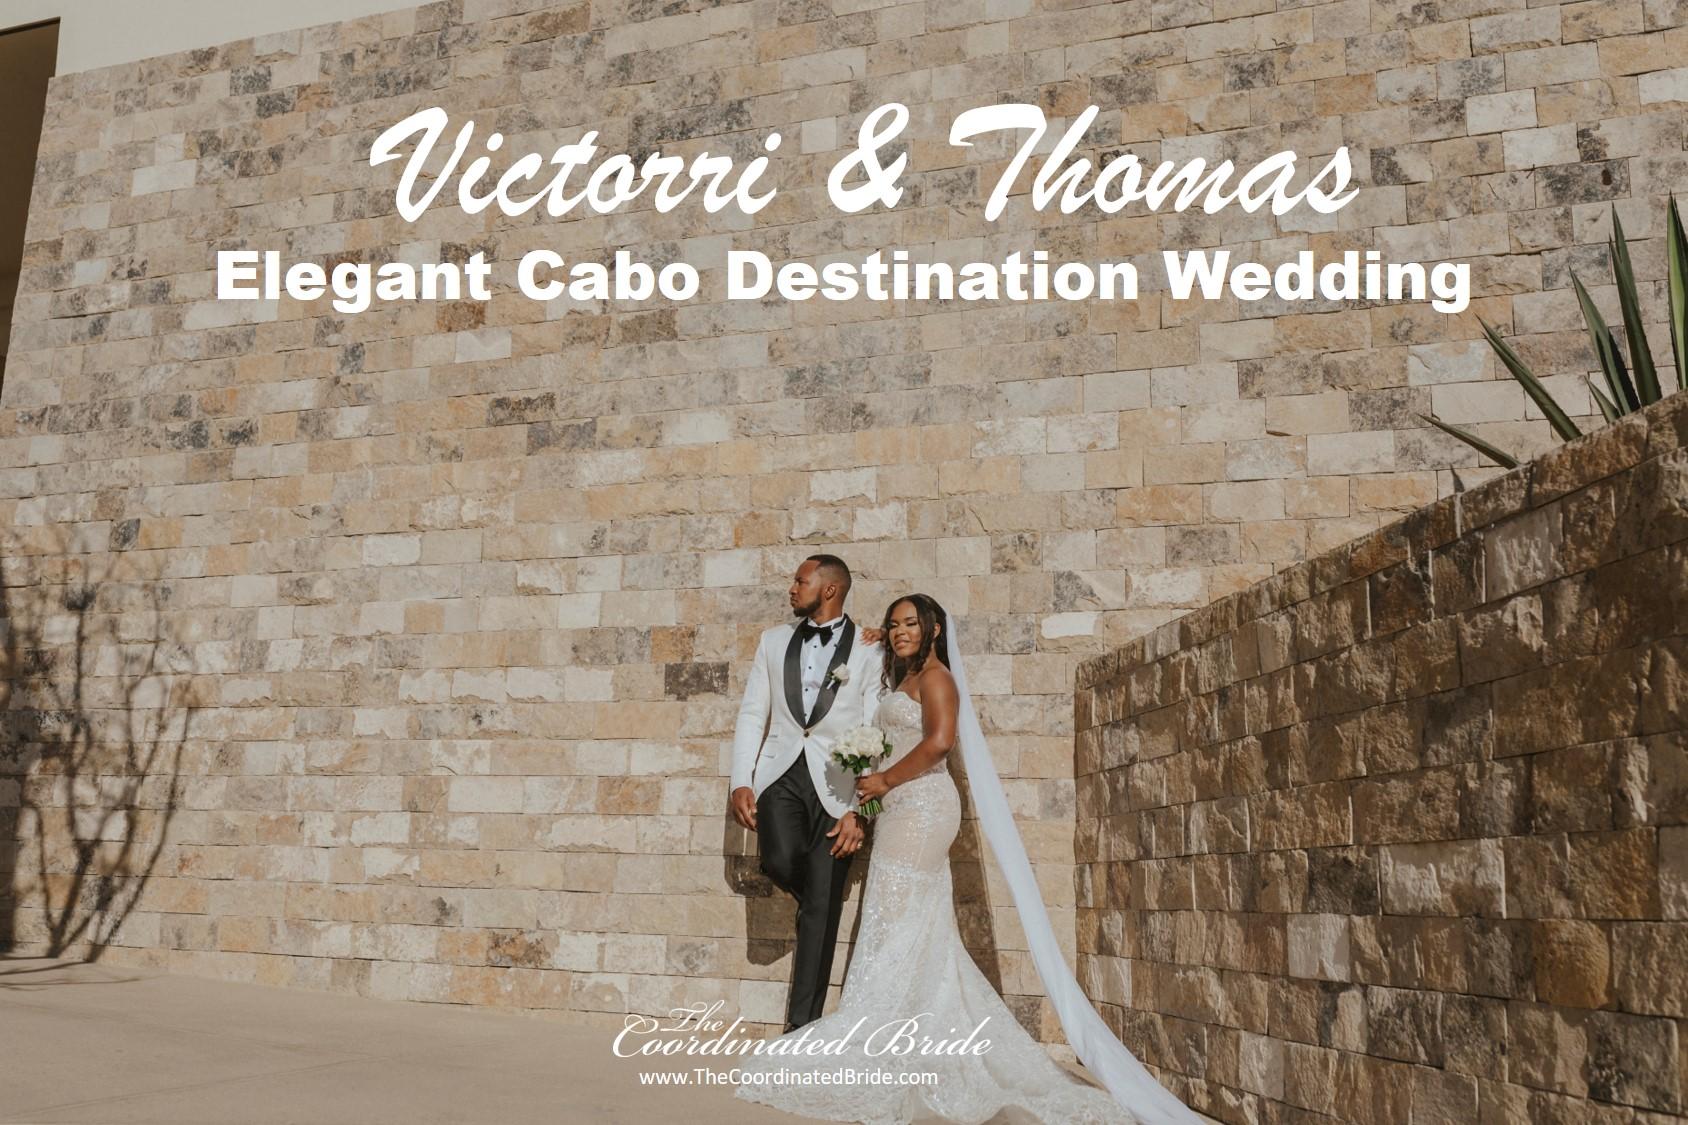 A Cabo Destination Wedding, Victorri & Thomas